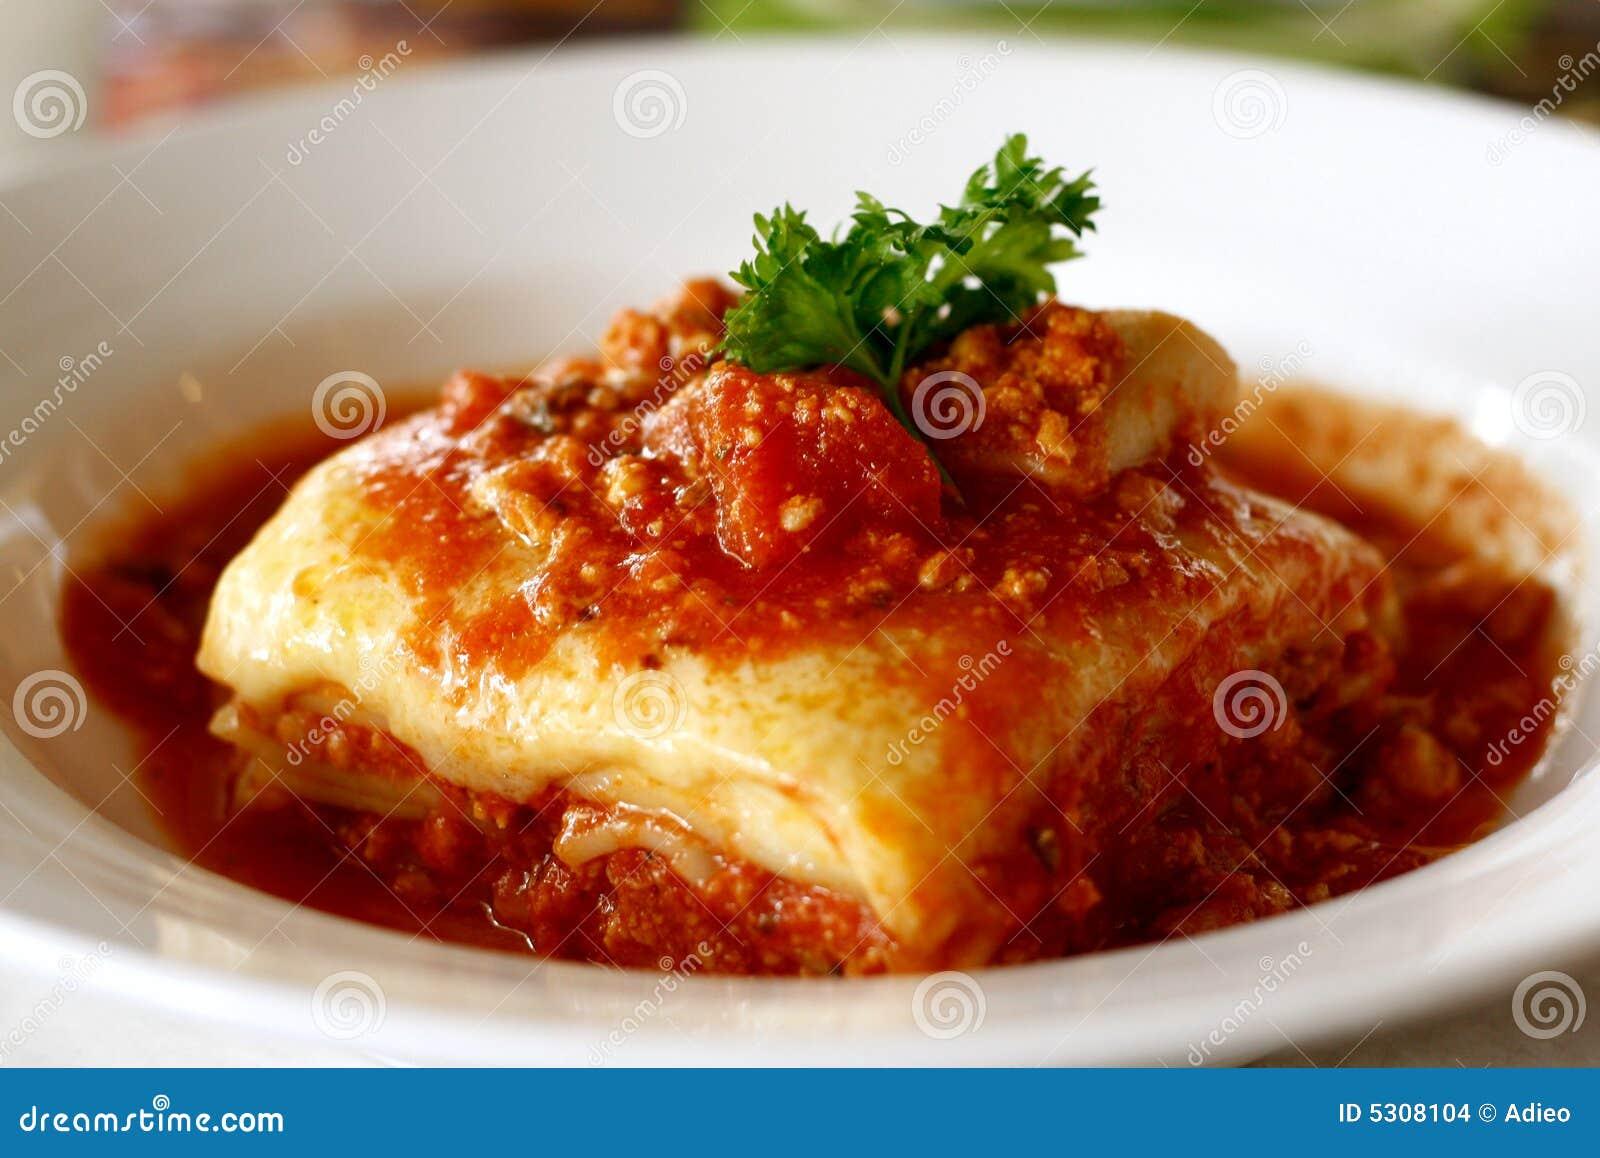 Download Lasagna fotografia stock. Immagine di naughty, cuisine - 5308104